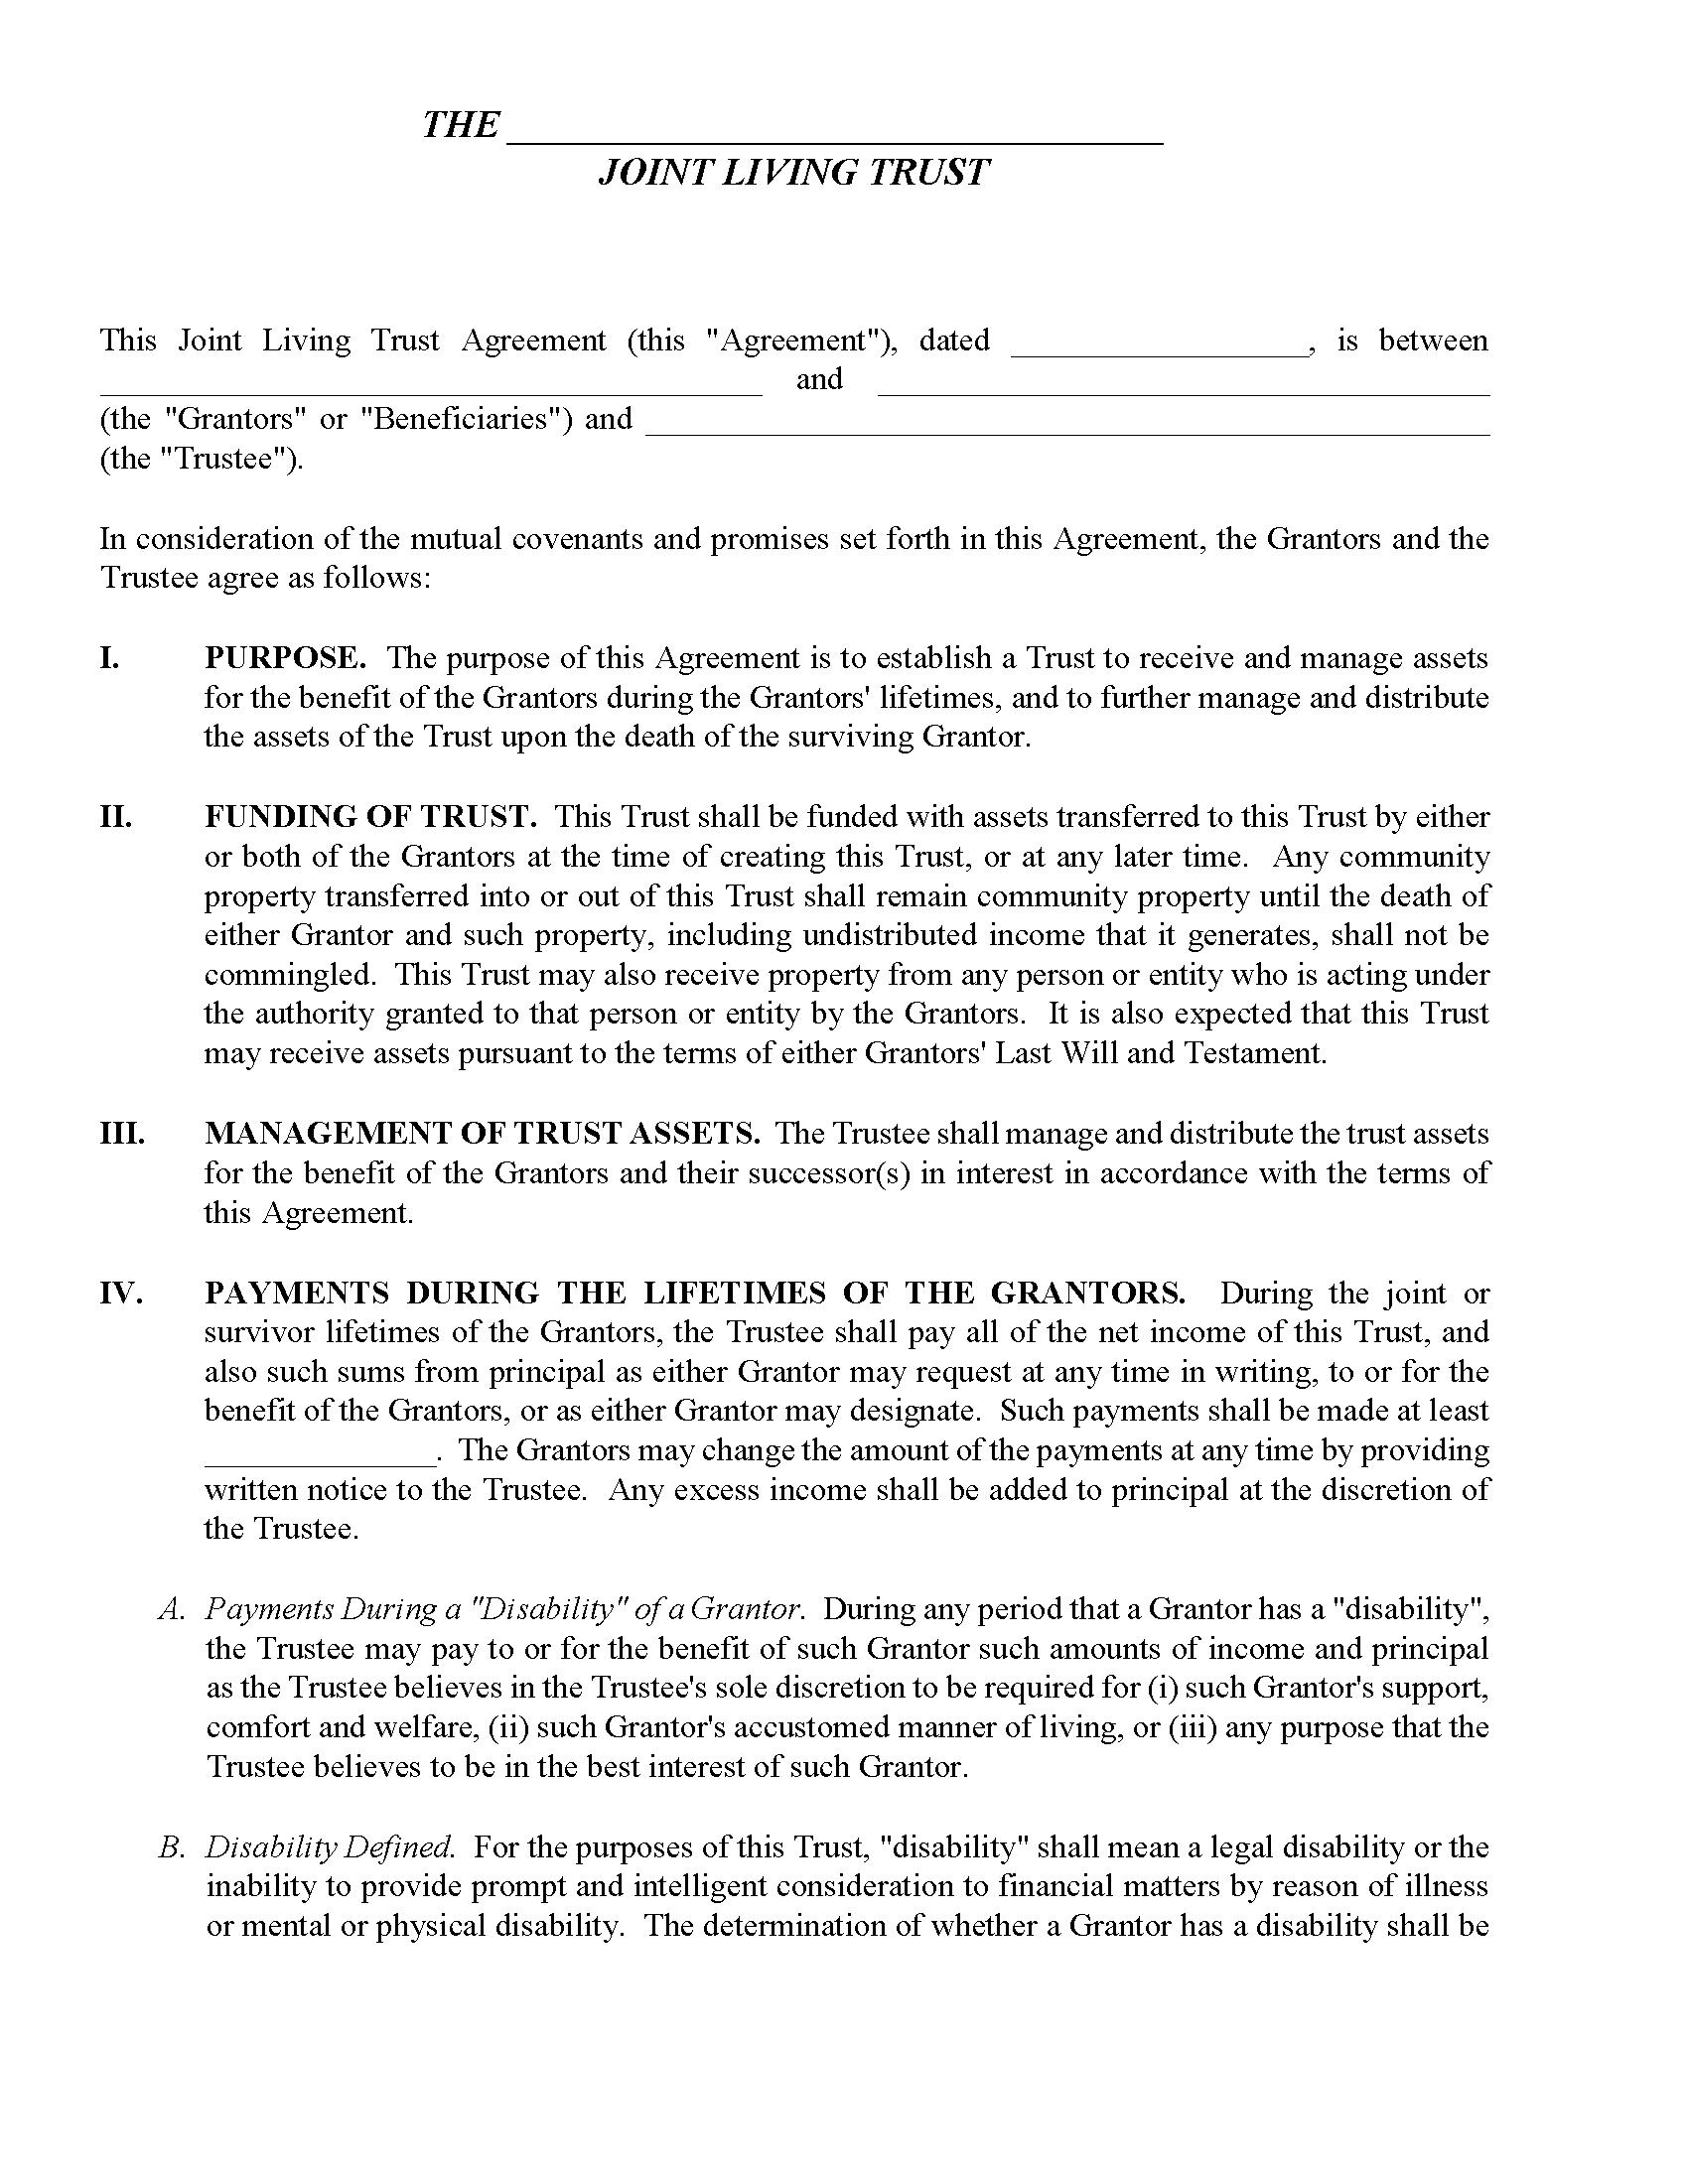 South Dakota Joint Living Trust Form